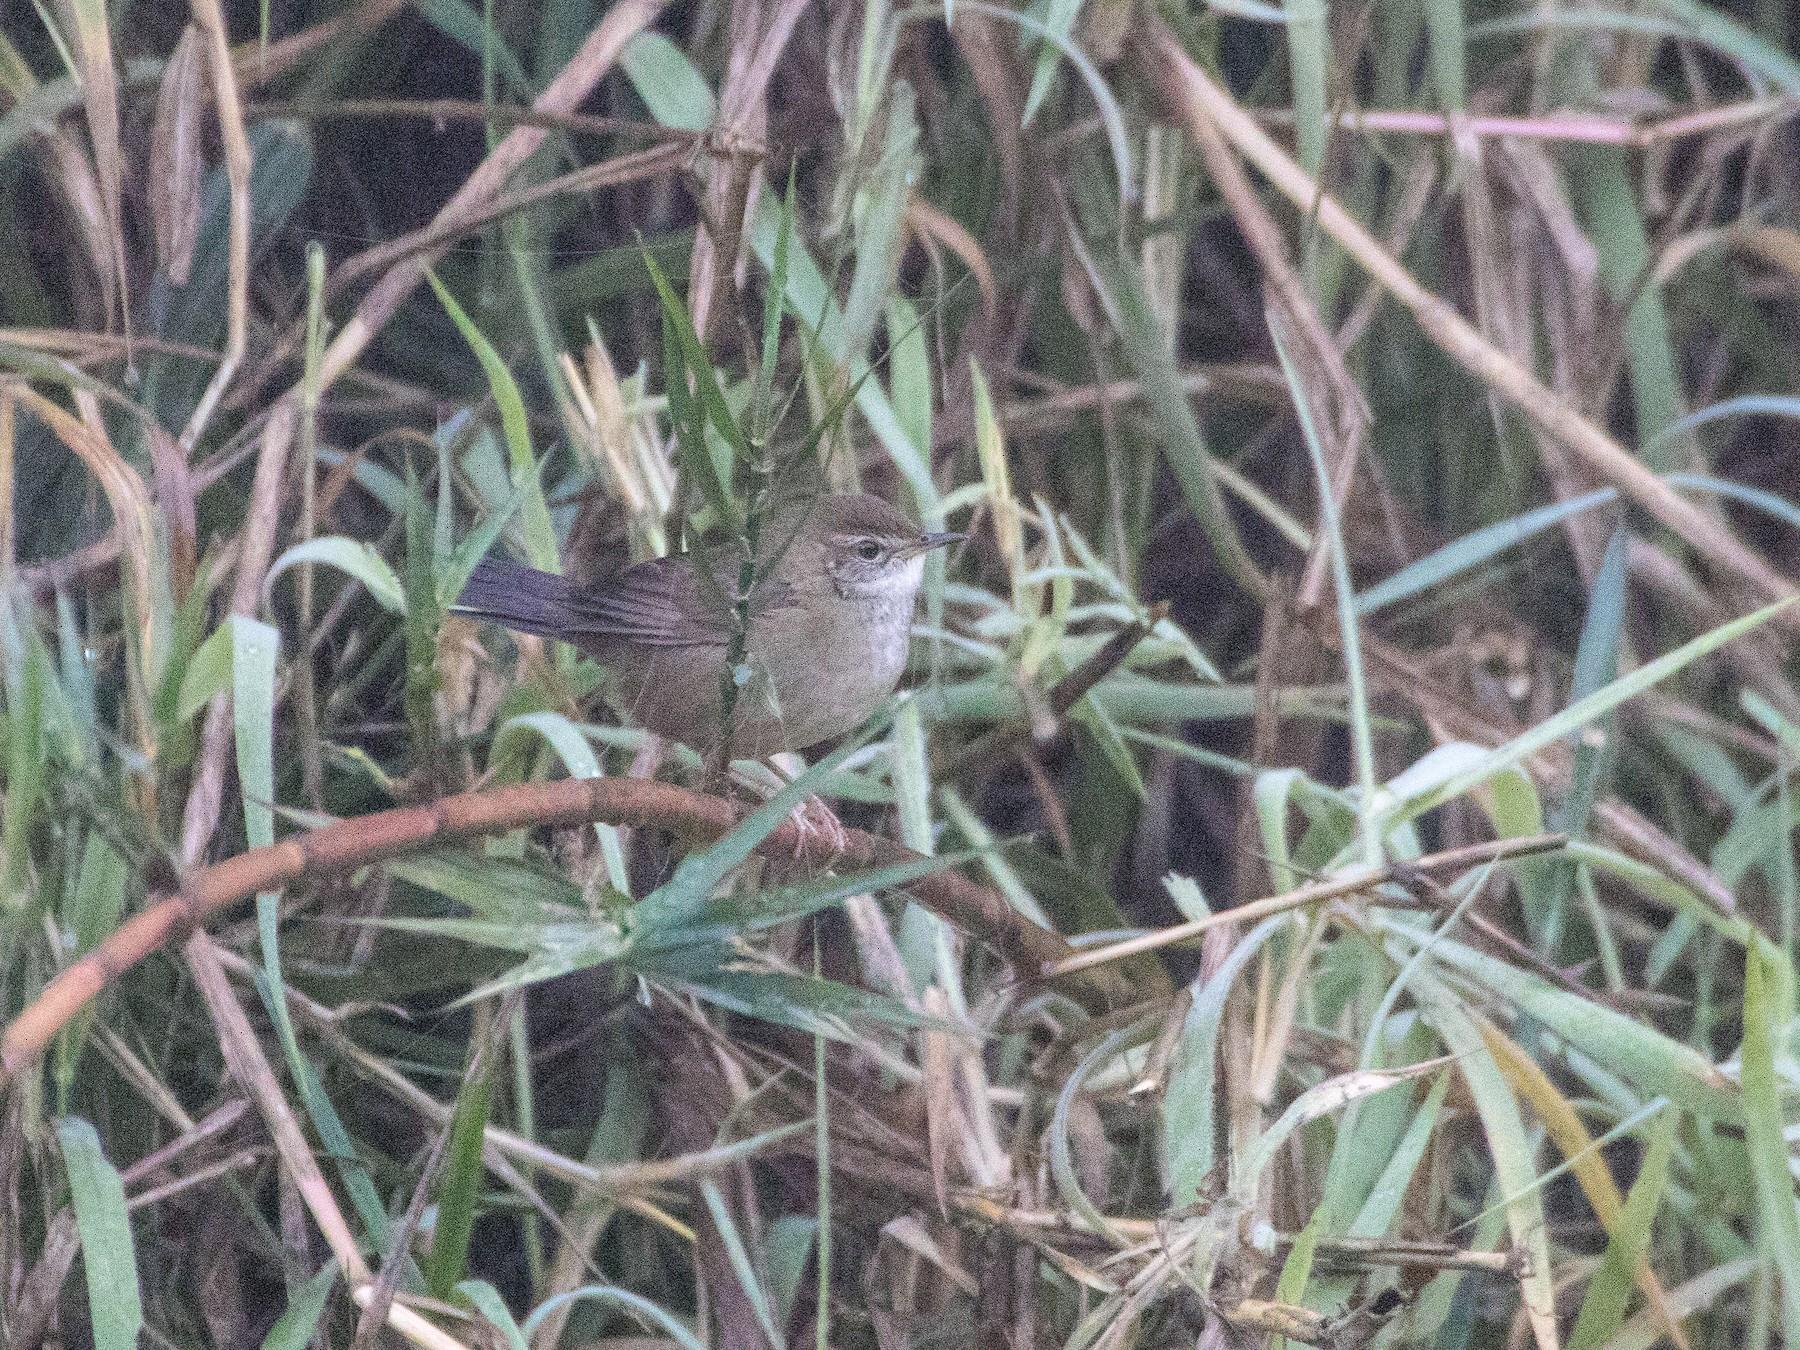 Spotted Bush Warbler - Thomas Job